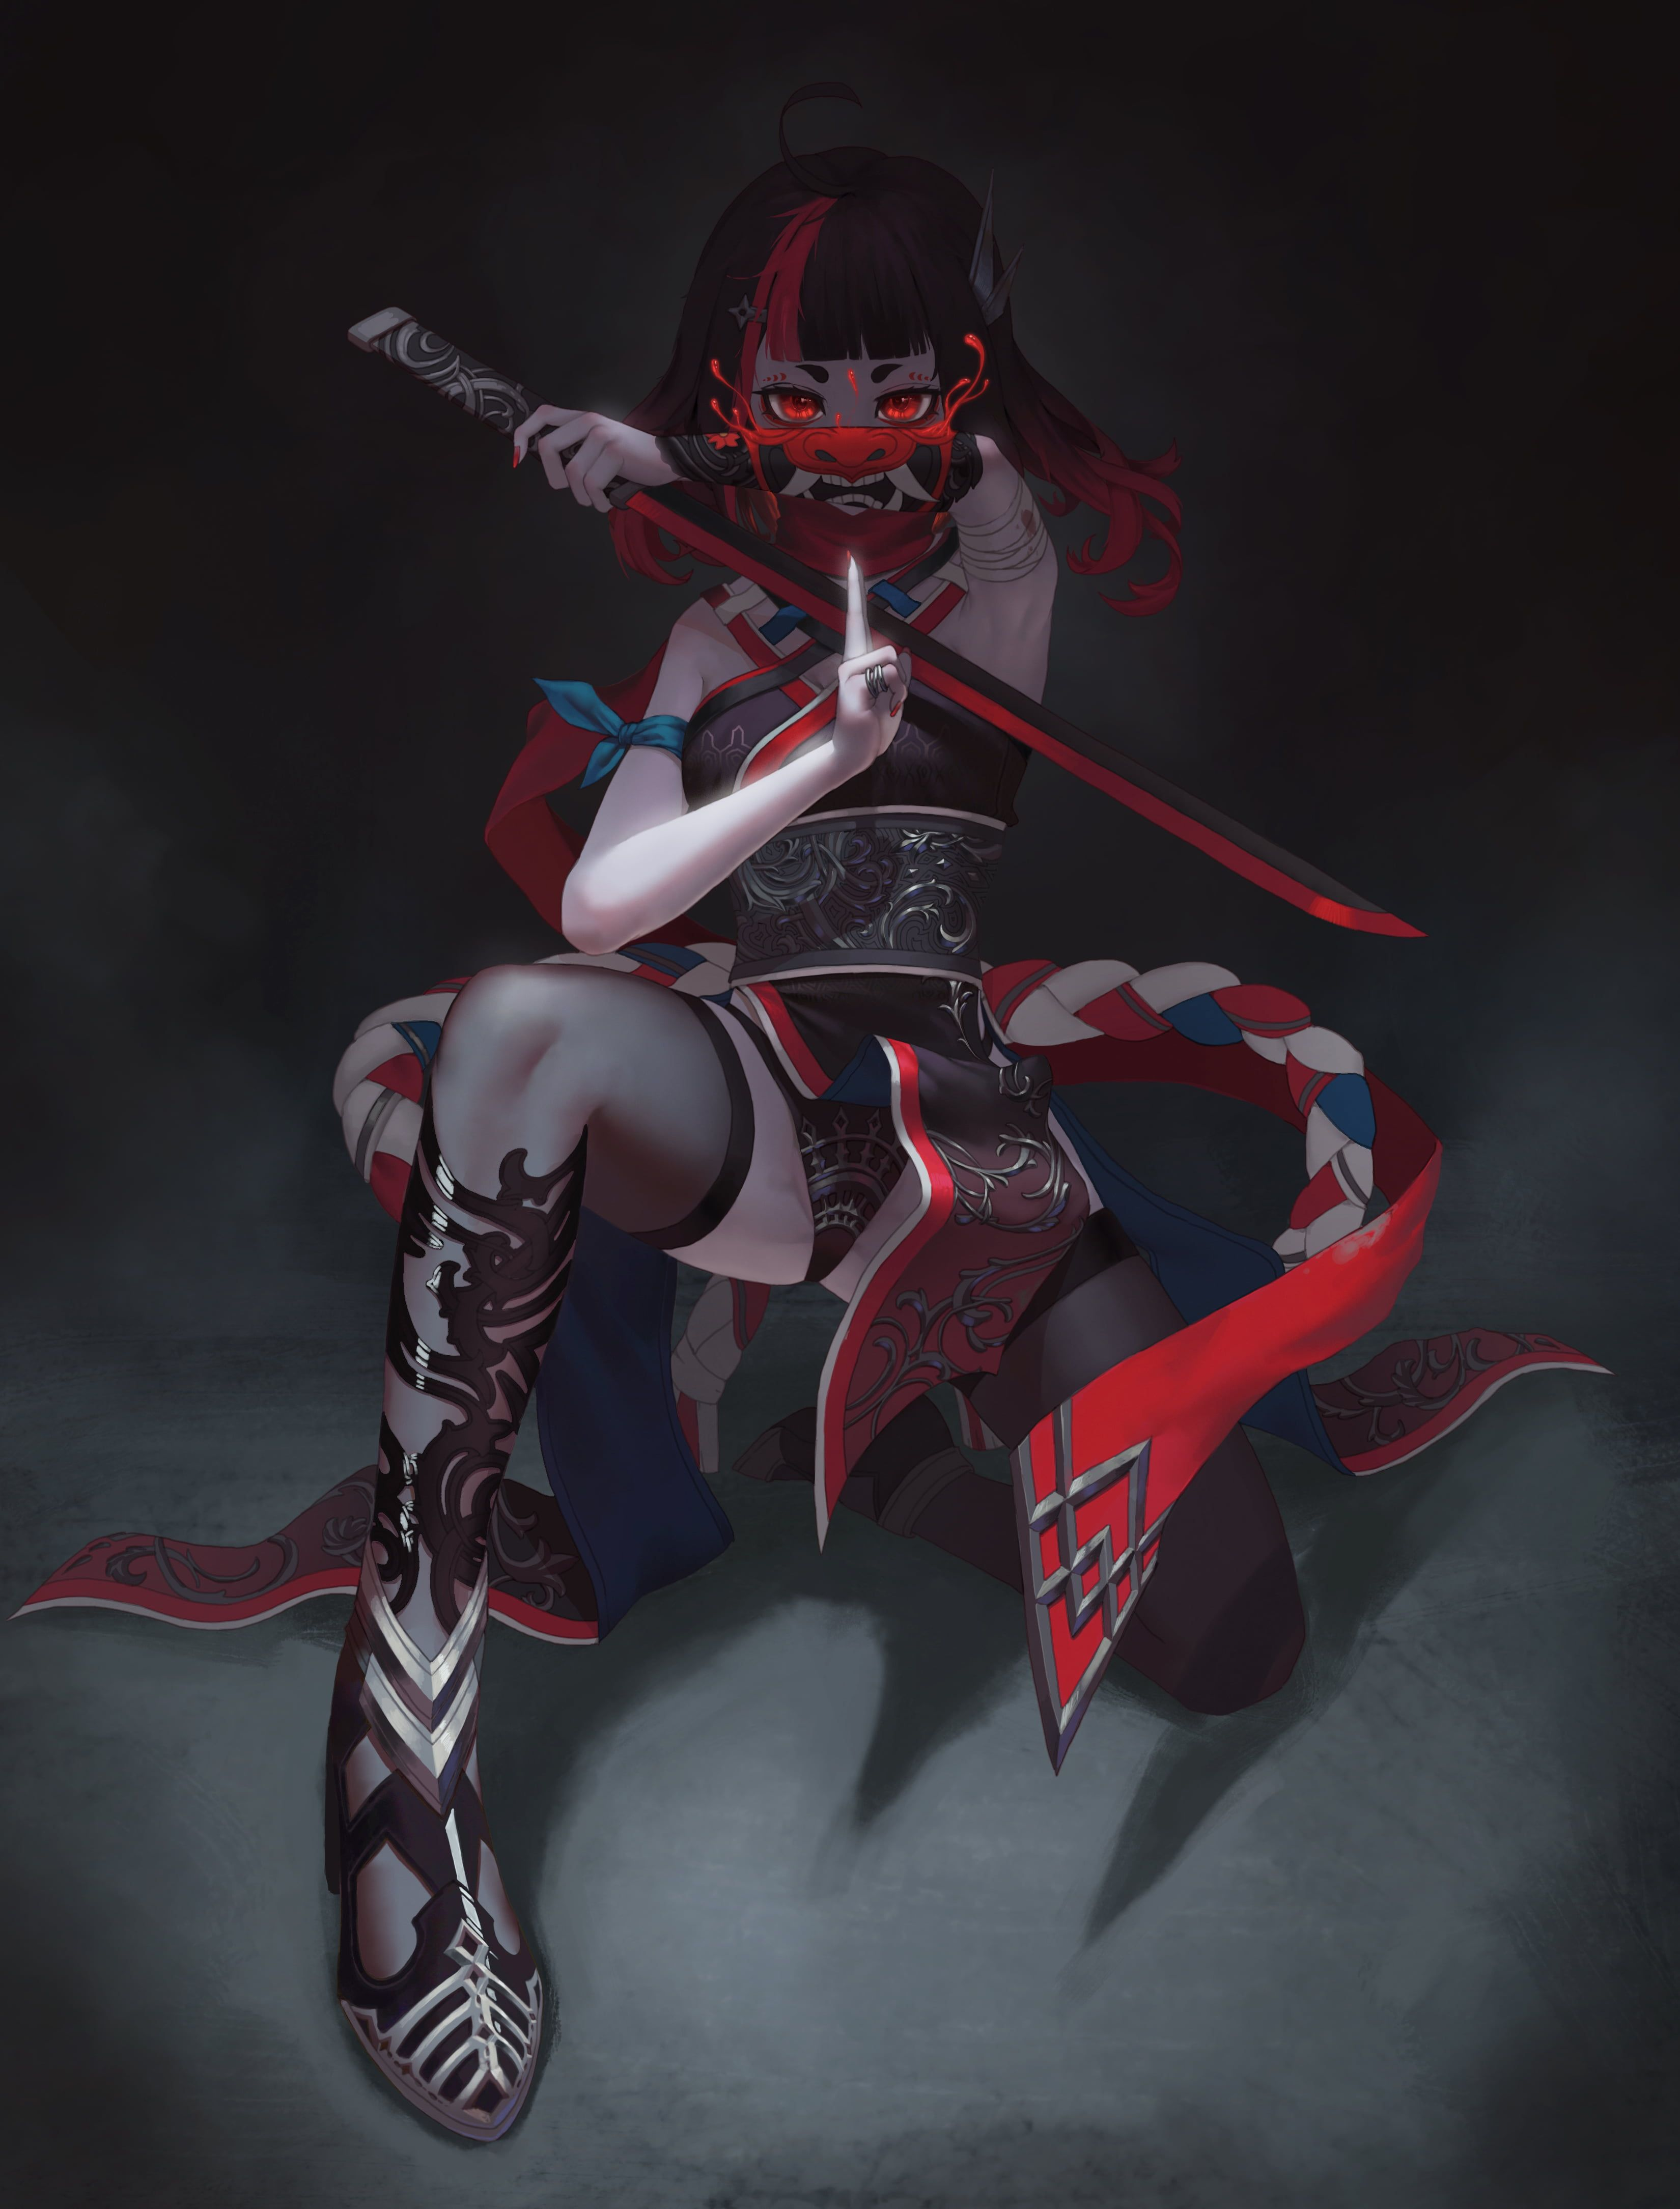 Ninja Girl Oni Mask Sword Red Eyes Artwork Minimalism 4k Wallpaper Hdwallpaper Desktop Ninja Girl Anime Warrior Oni Mask